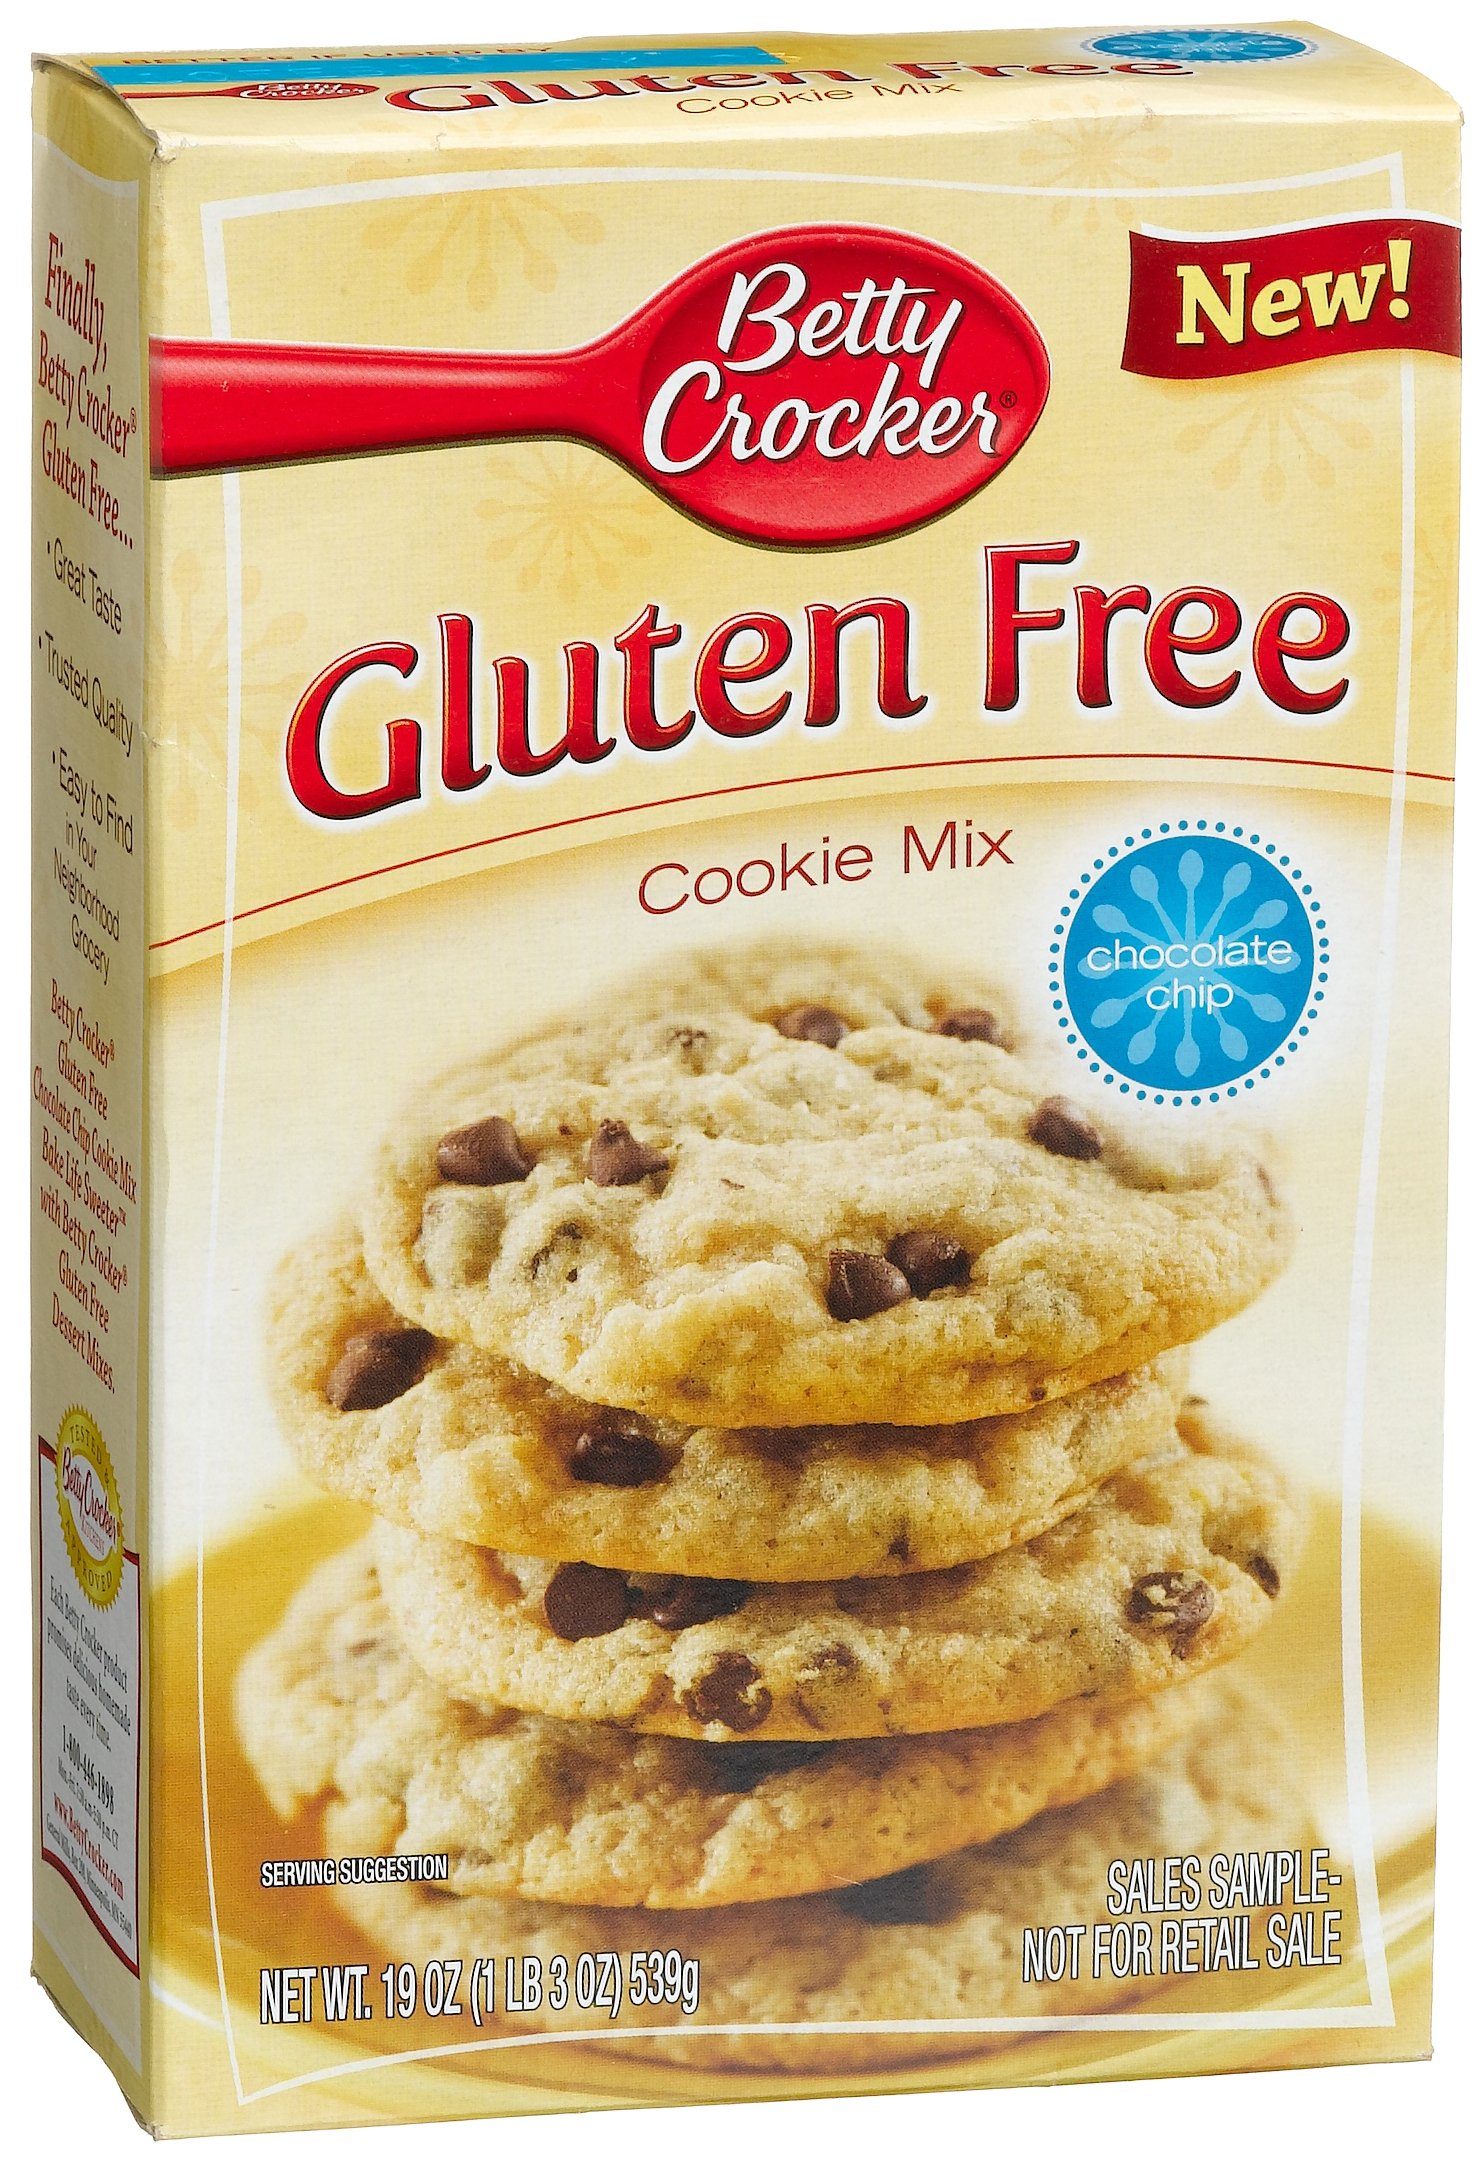 Betty Crocker Baking Mix, Gluten Free Cookie Mix, Chocolate Chip, 19 Oz Box (Pack of 6) by Betty Crocker (Image #2)